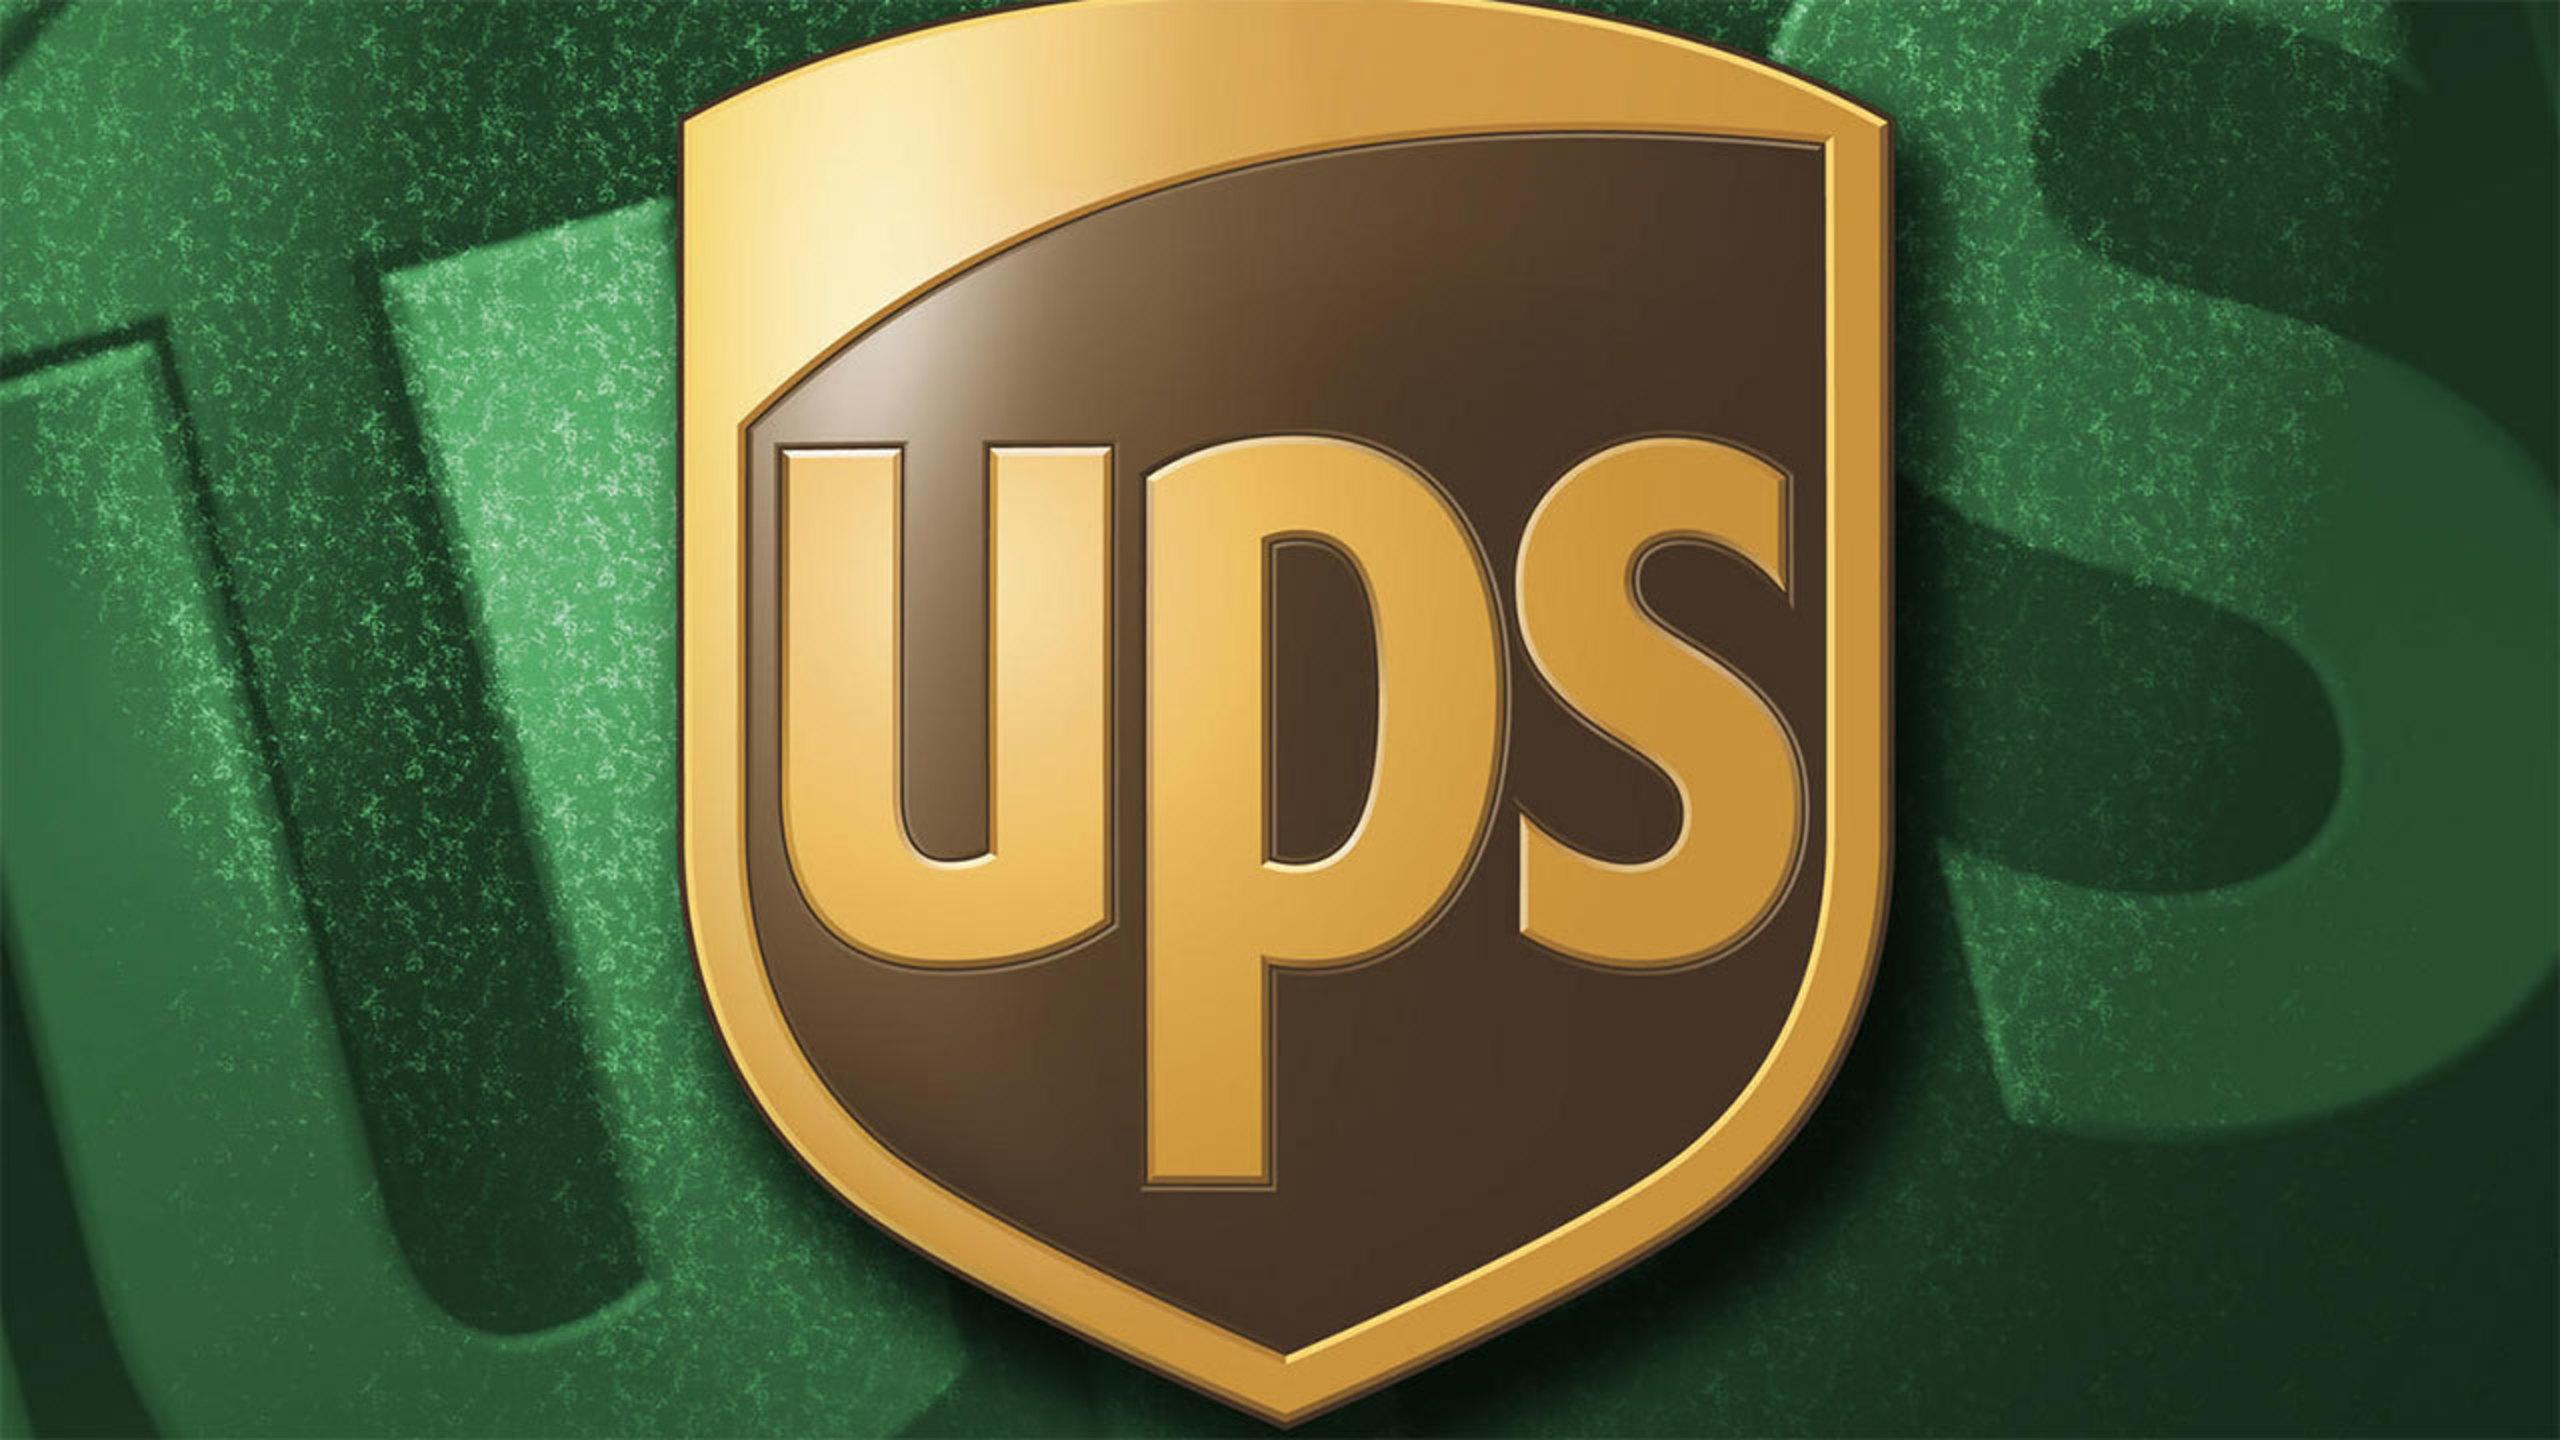 UPS plans to hire 100,000 seasonal workers | FOX 10 Phoenix